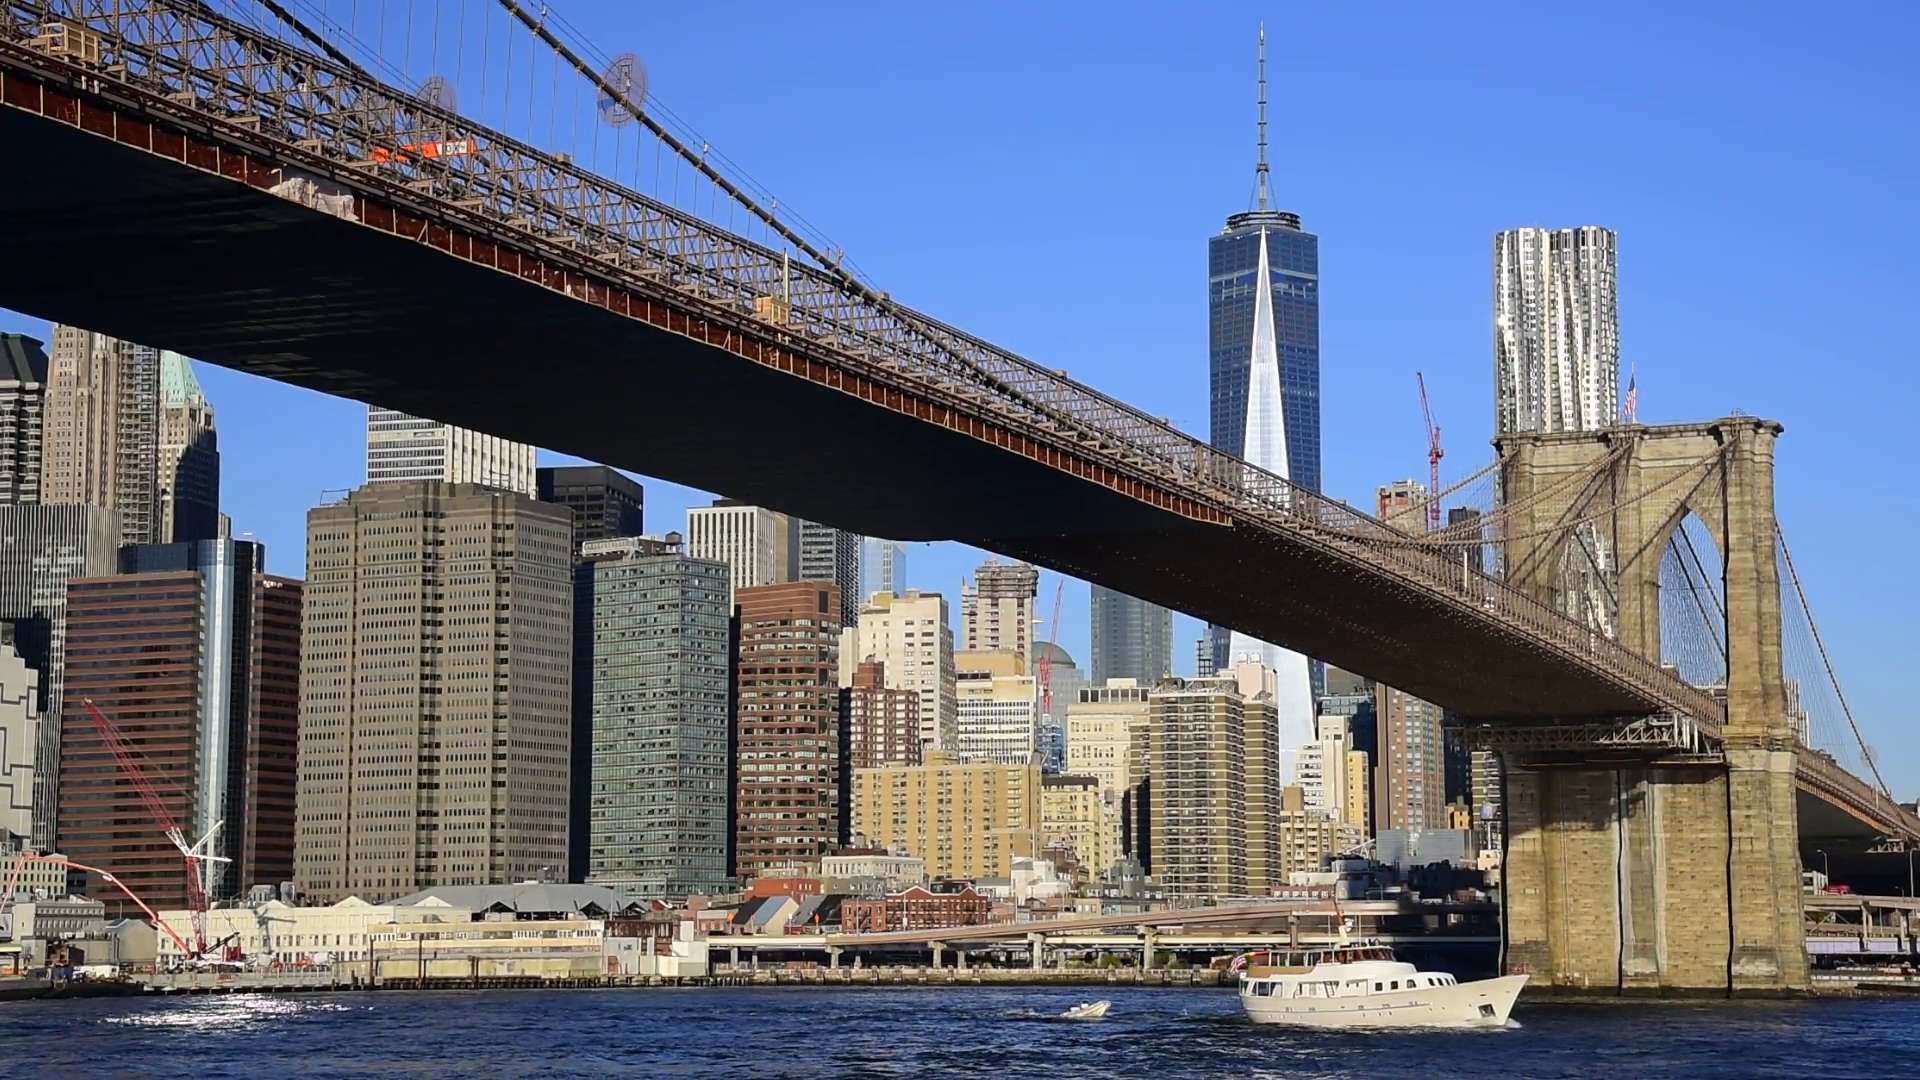 USA, New York, Manhattan, Lower Manhattan, East River, Brooklyn ...